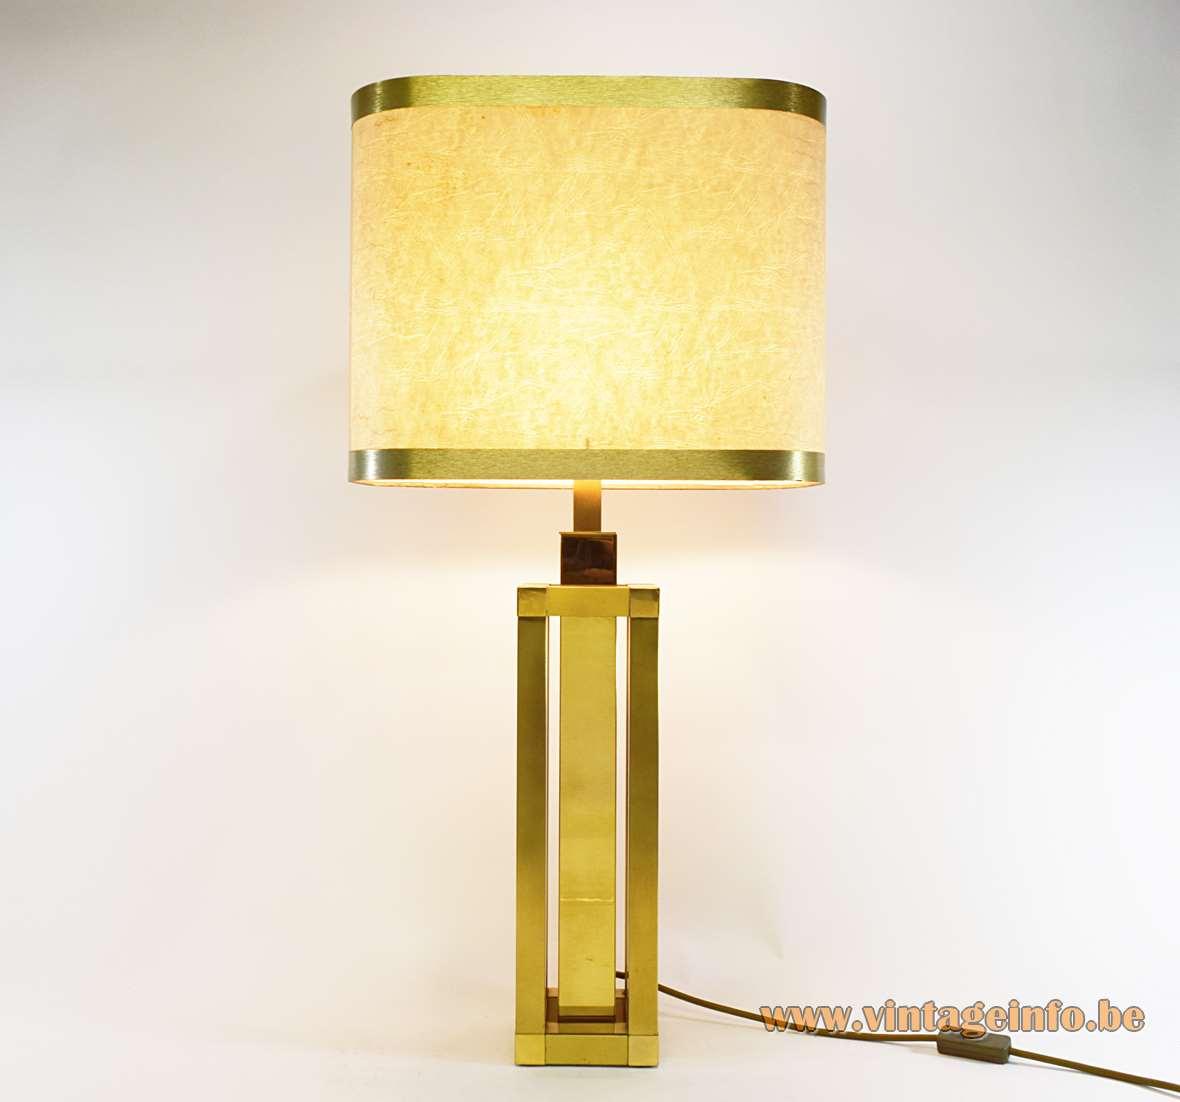 Romeo Rega Square Brass Tubes Table Lamp sculptural geometric design brushed polished 1970s MCM